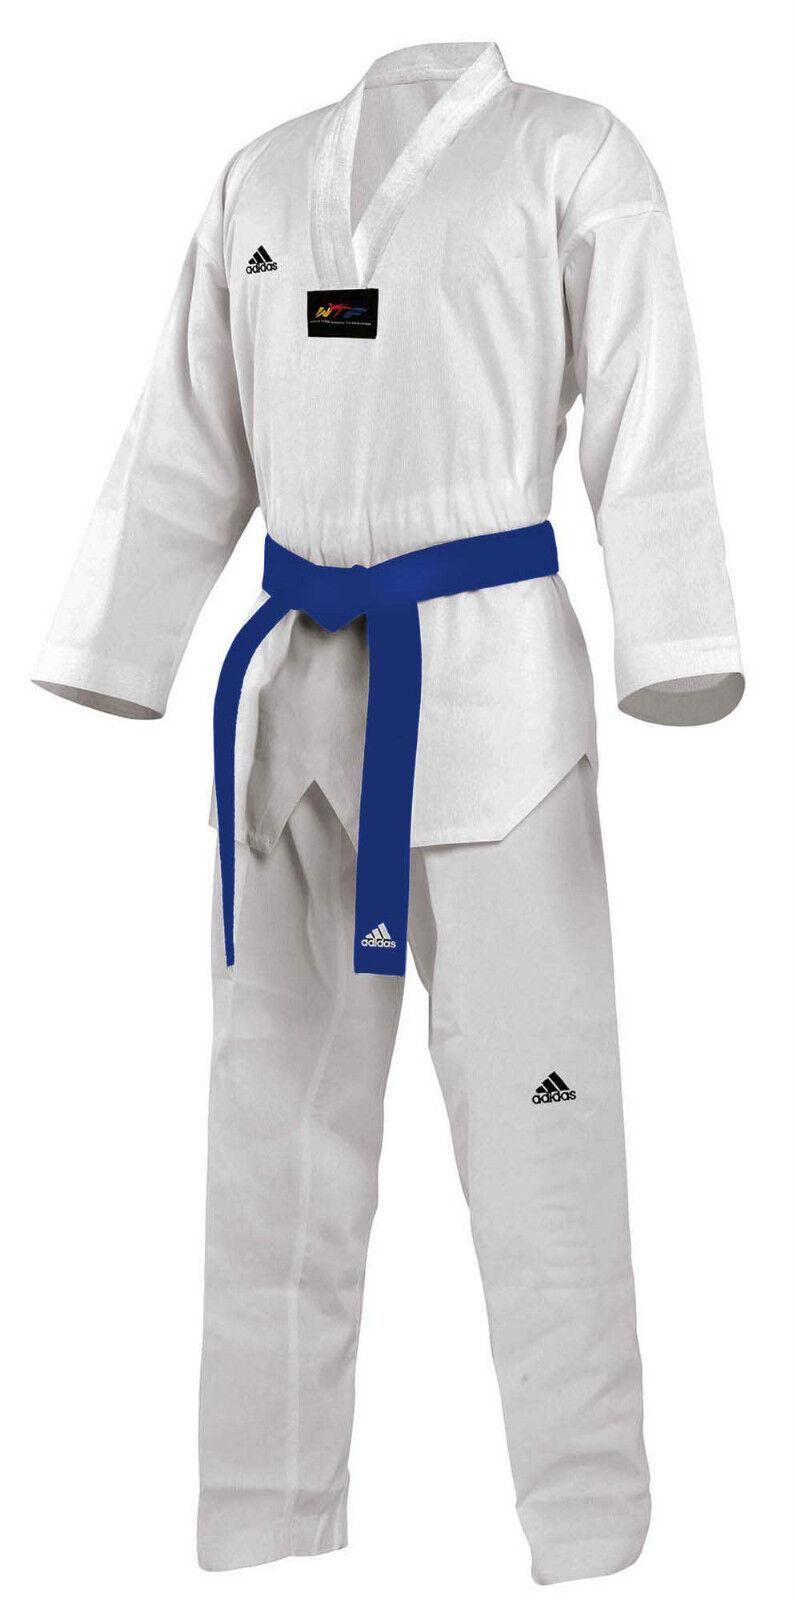 Adidas Taekwondoanzug  adi Start  - adistart adistart adistart - Taekwondo Anzug 197b66